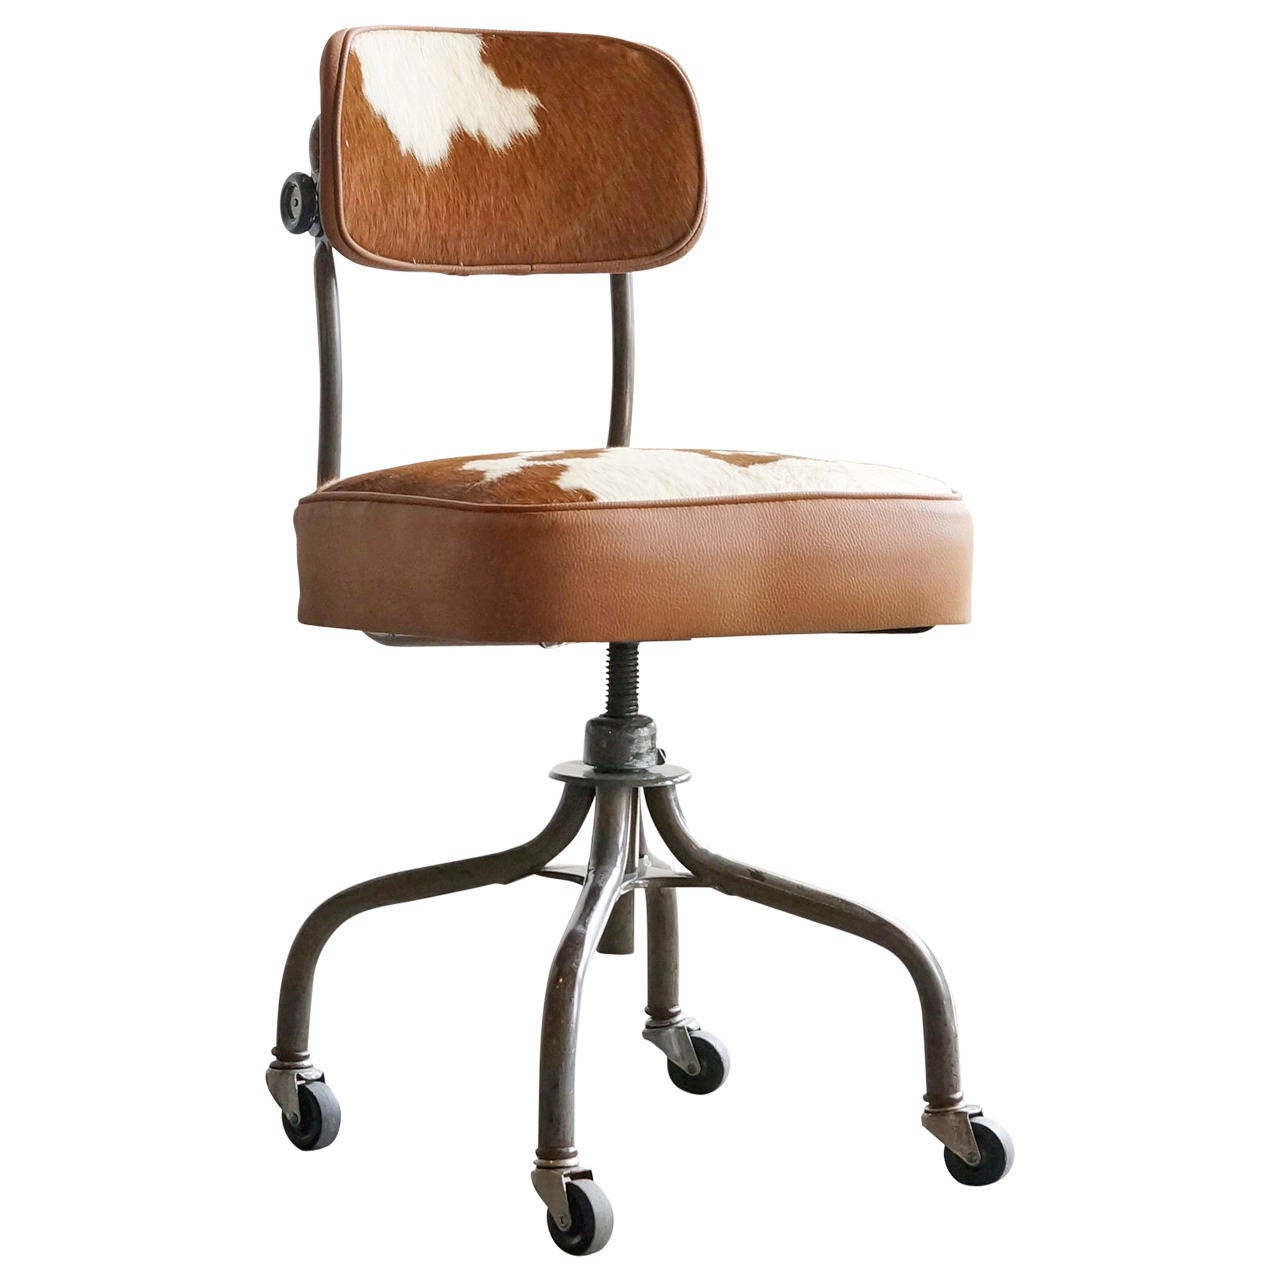 1940s Steelcase Task Chair In Cowhide At 1stdibs